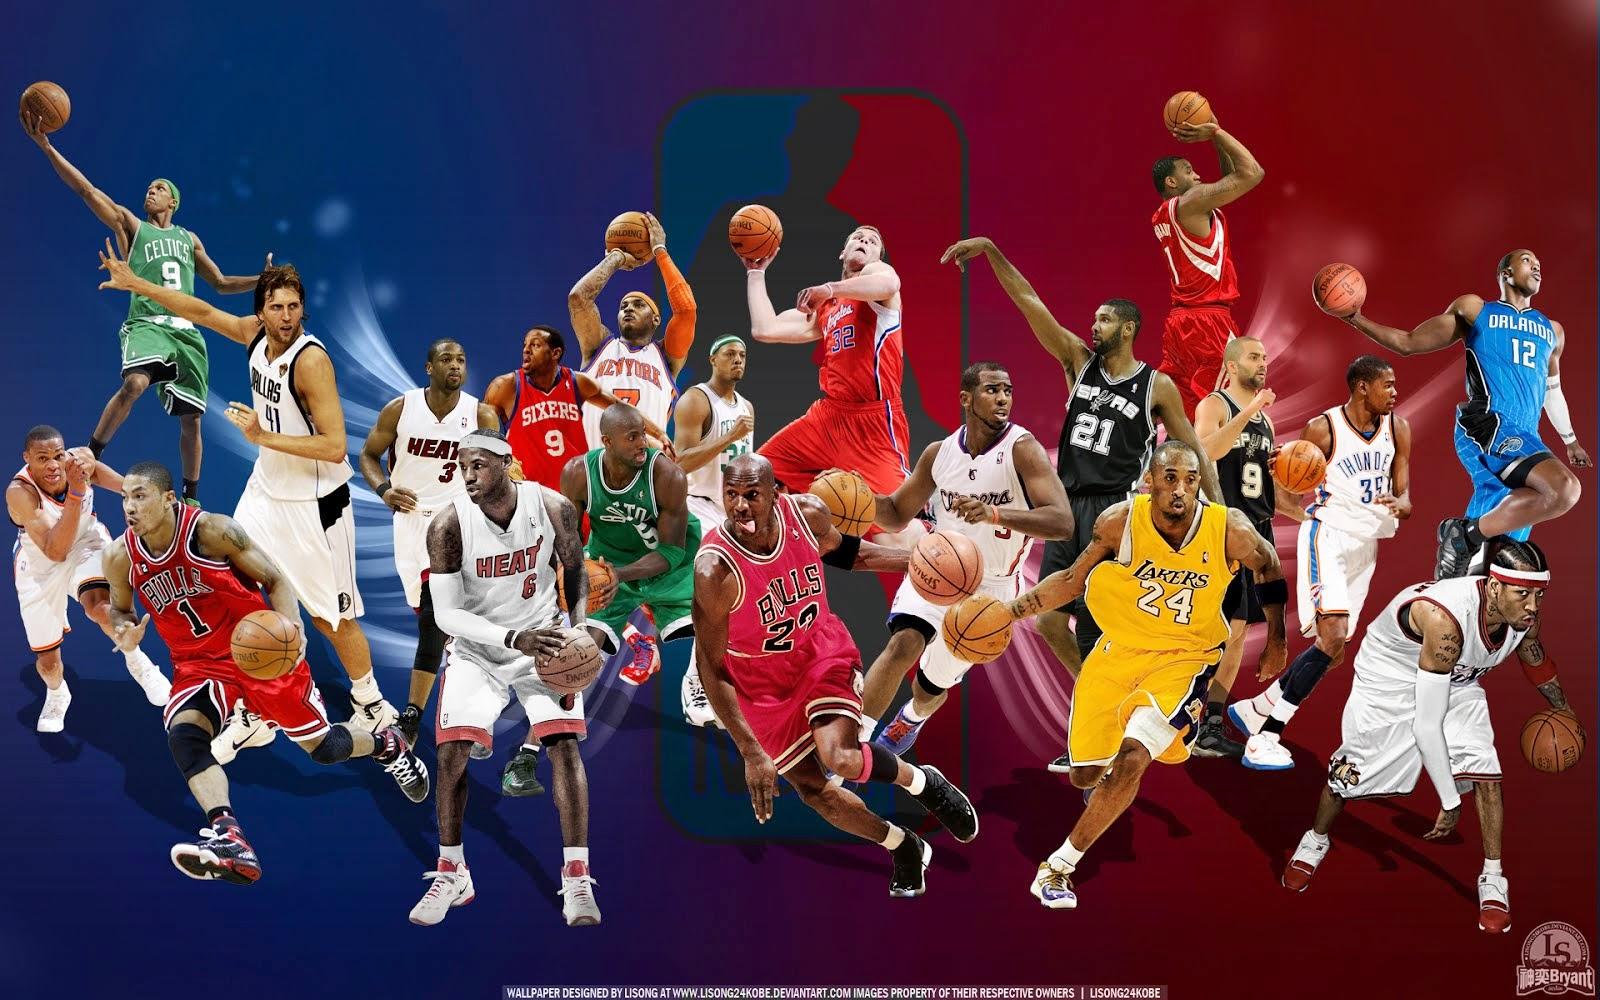 basketball stars picture Nba All Star Wallpaper 1600x1000